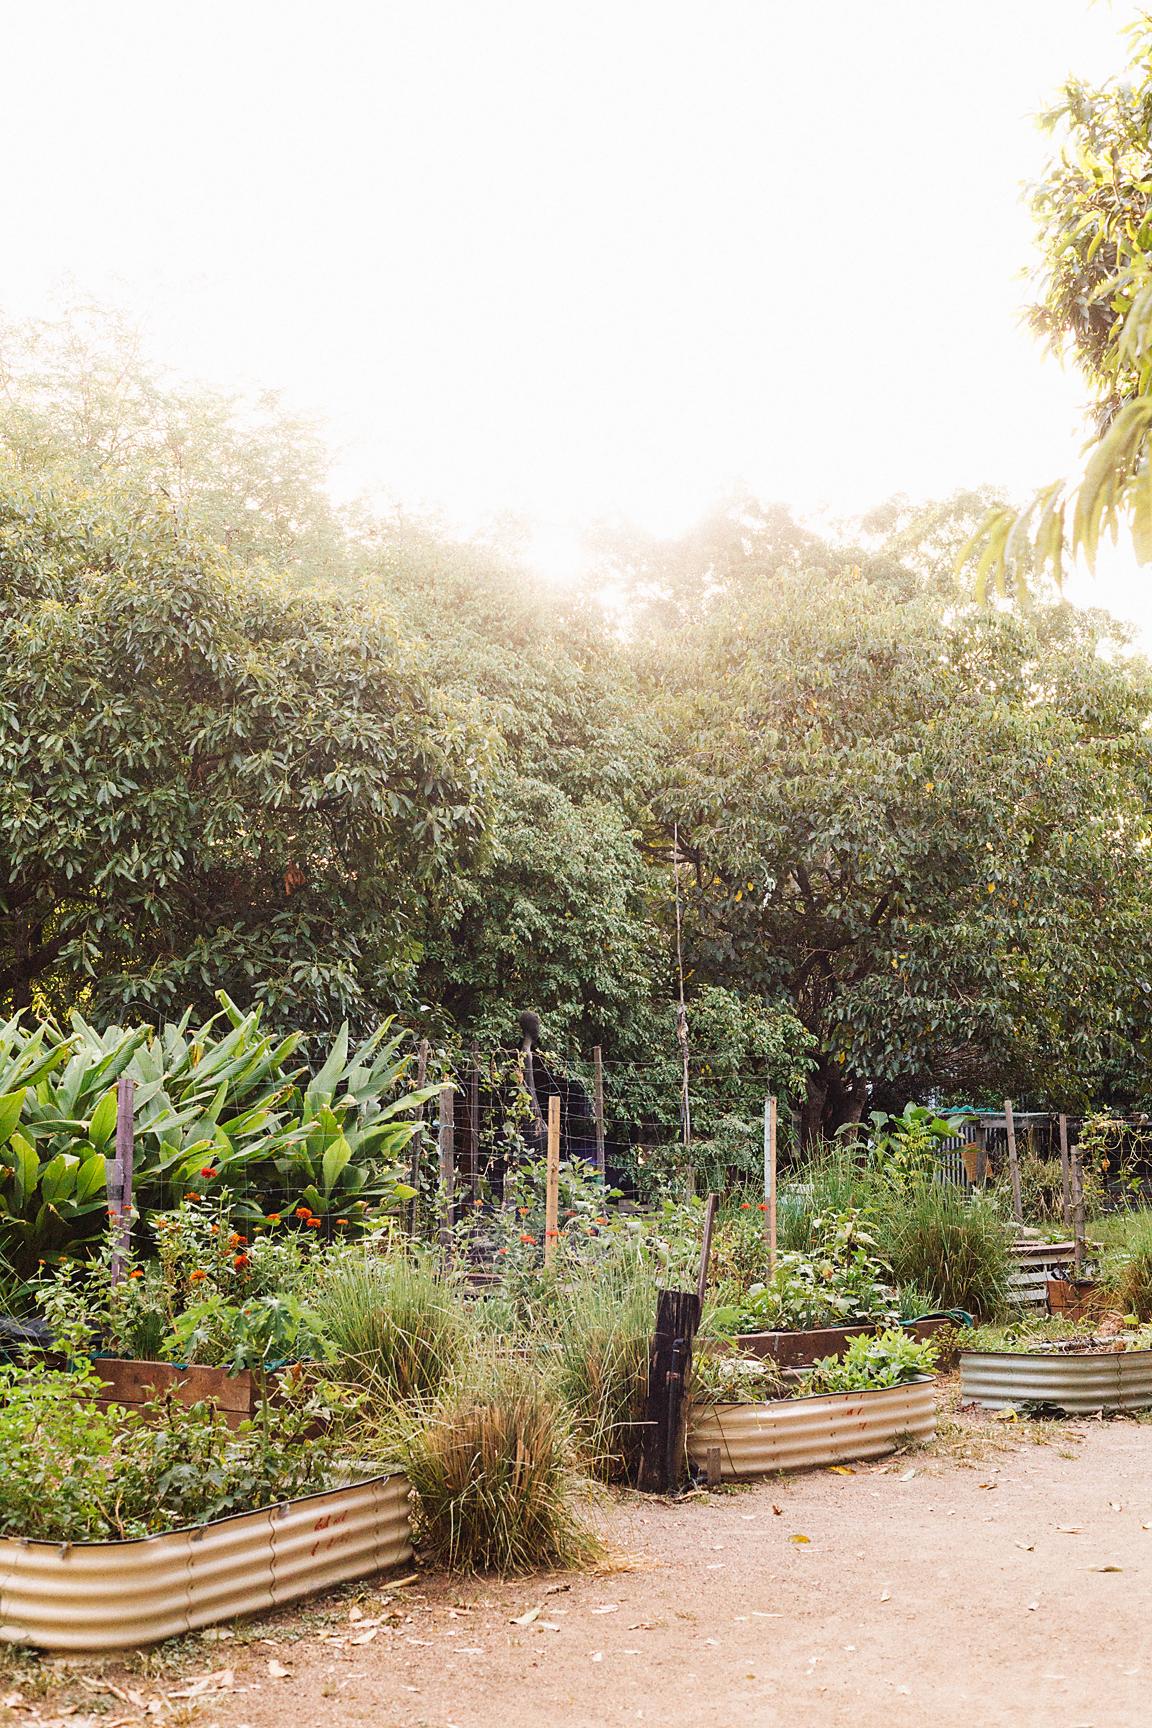 Northey Street City Farm & immediate surrounds (Poppy & Sage Photography)